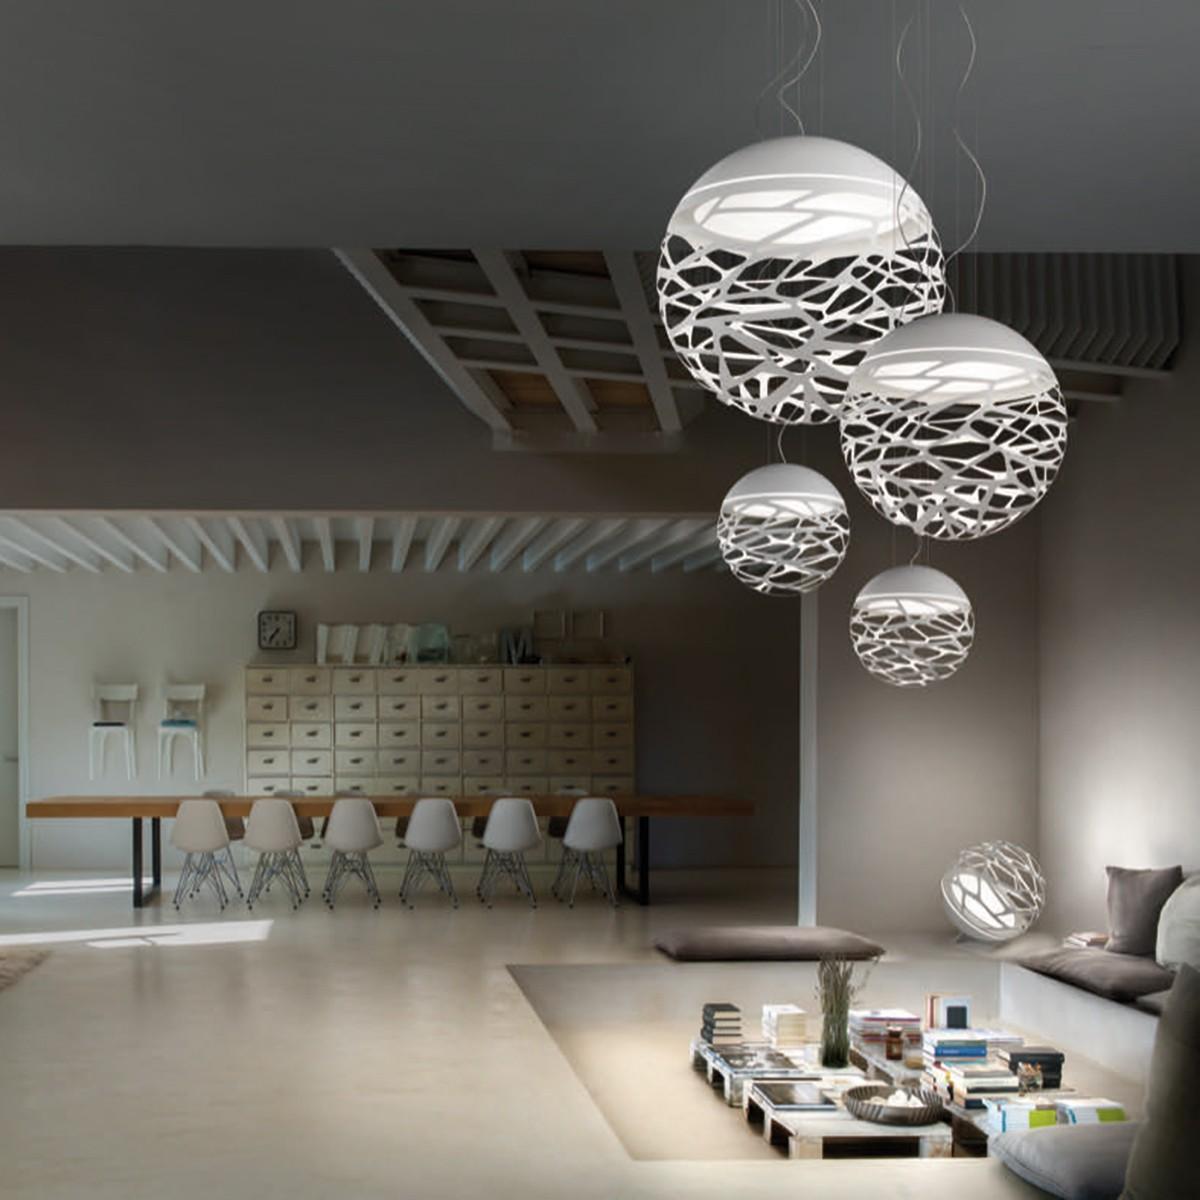 Studio Italia Design Kelly Large Sphere 80 Pendelleuchte, weiß matt